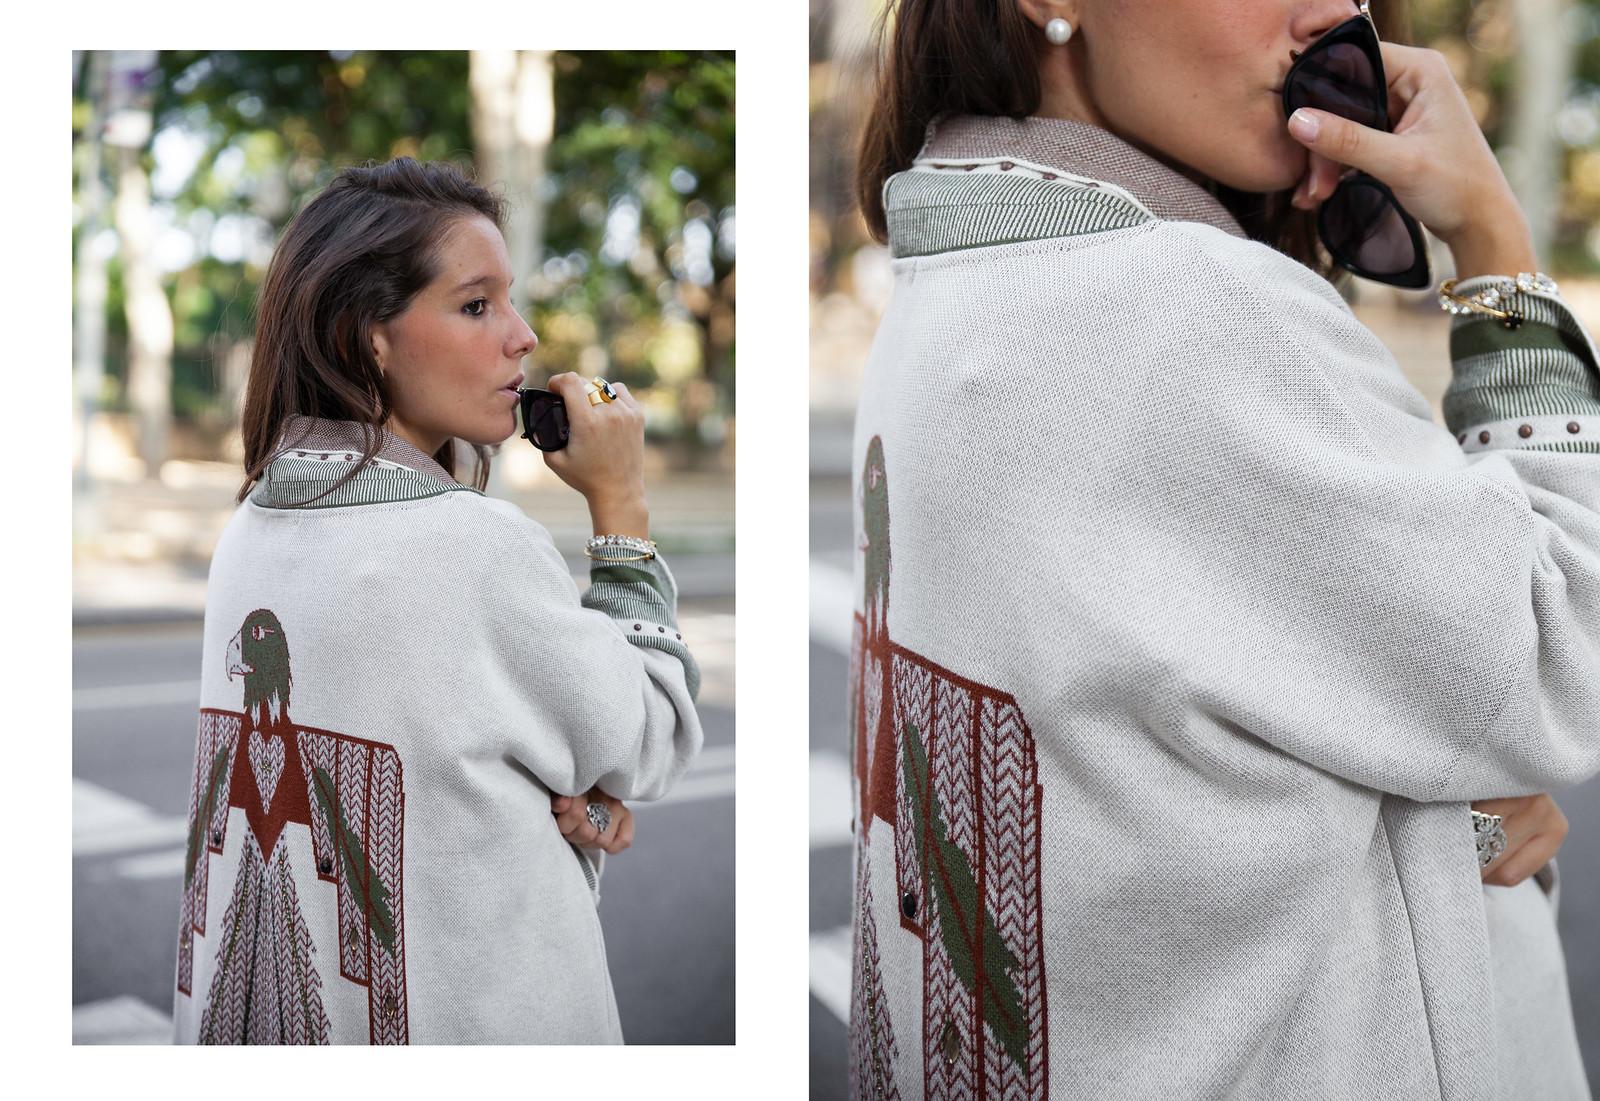 05_Como_combinar_un_cardigan_khaki_etnico_otoño_theguestgirl_rüga_laura_santolaira_influencer_embarazada_fashion_street_style_barcelona